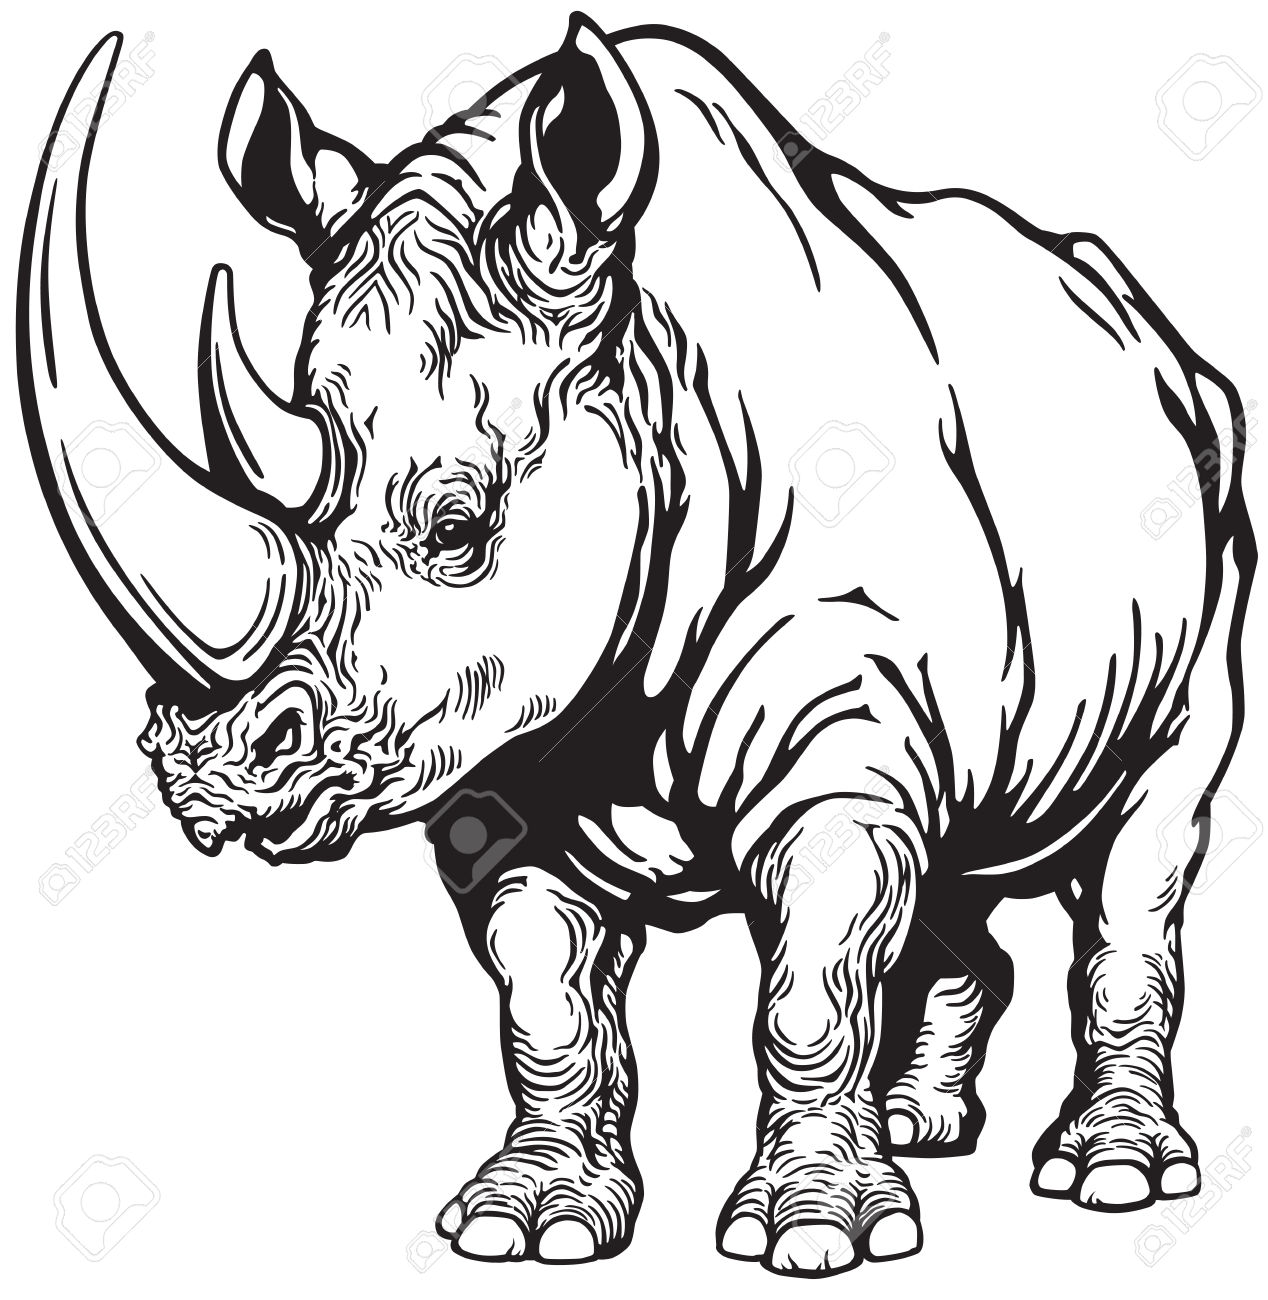 Standing Rhinoceros Or Rhino, Black And White Image Royalty Free.